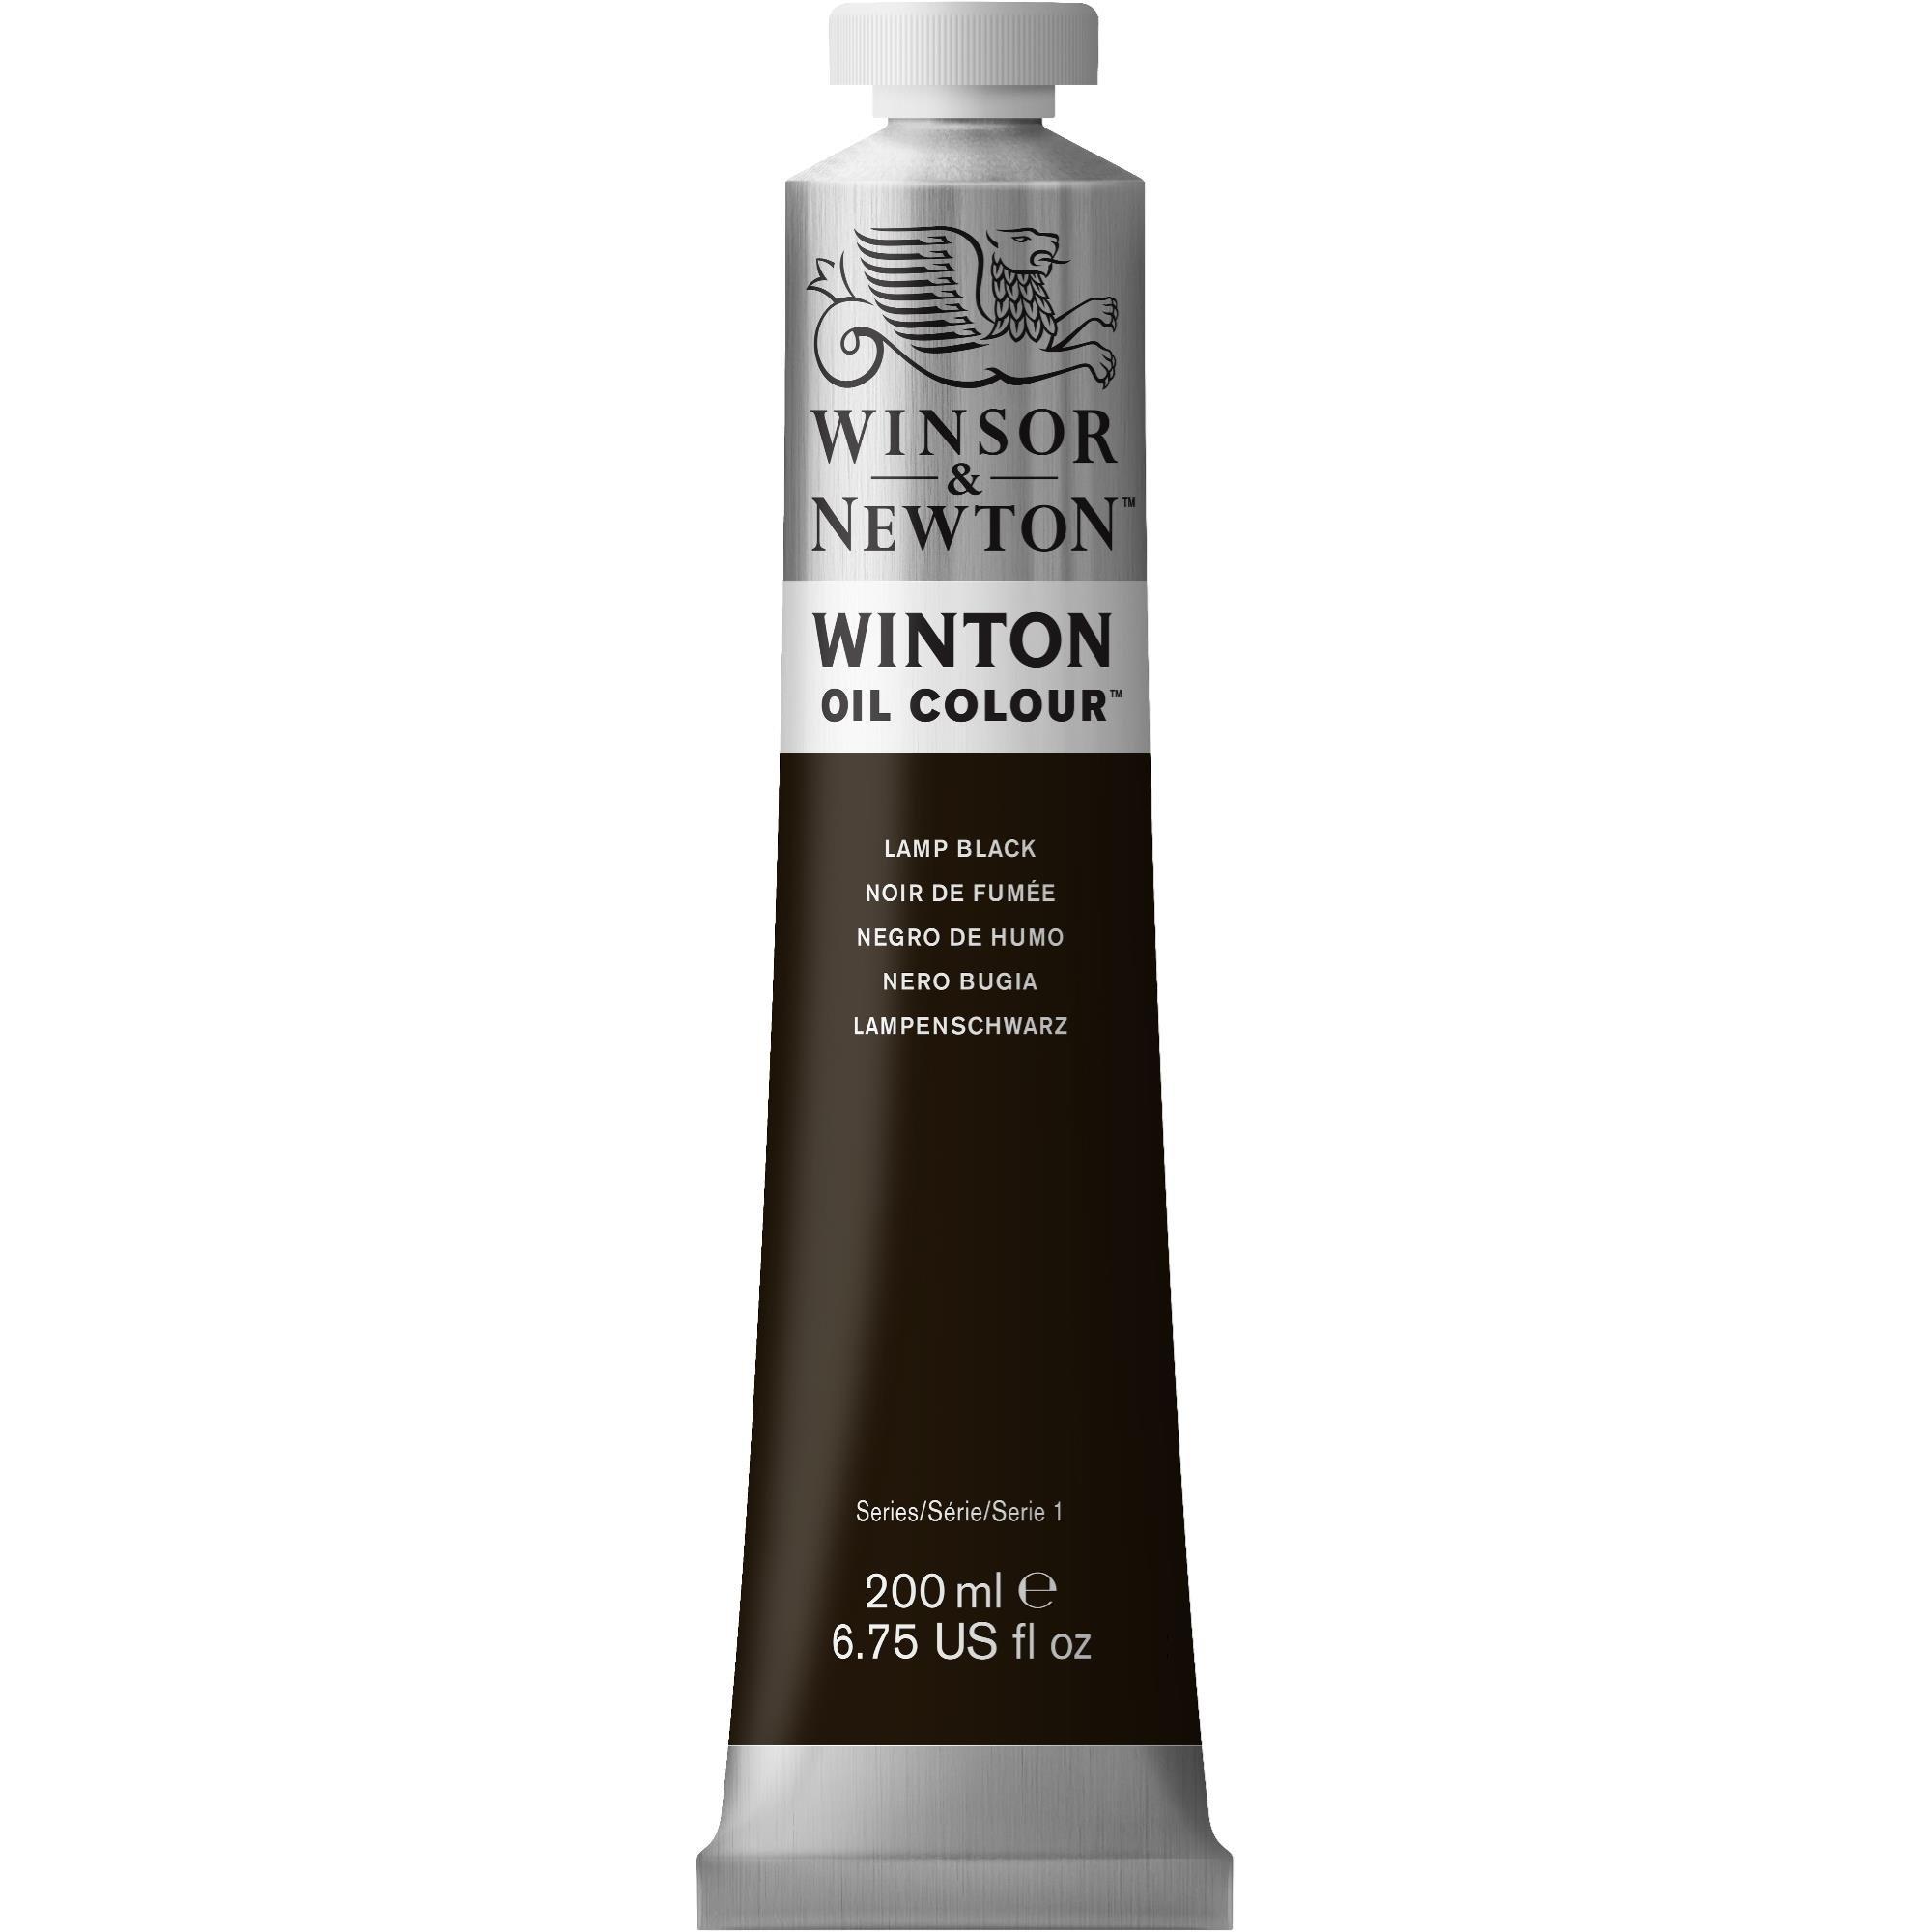 Winsor & Newton Winton Oil Colour Paint, 200ml tube, Lamp Black